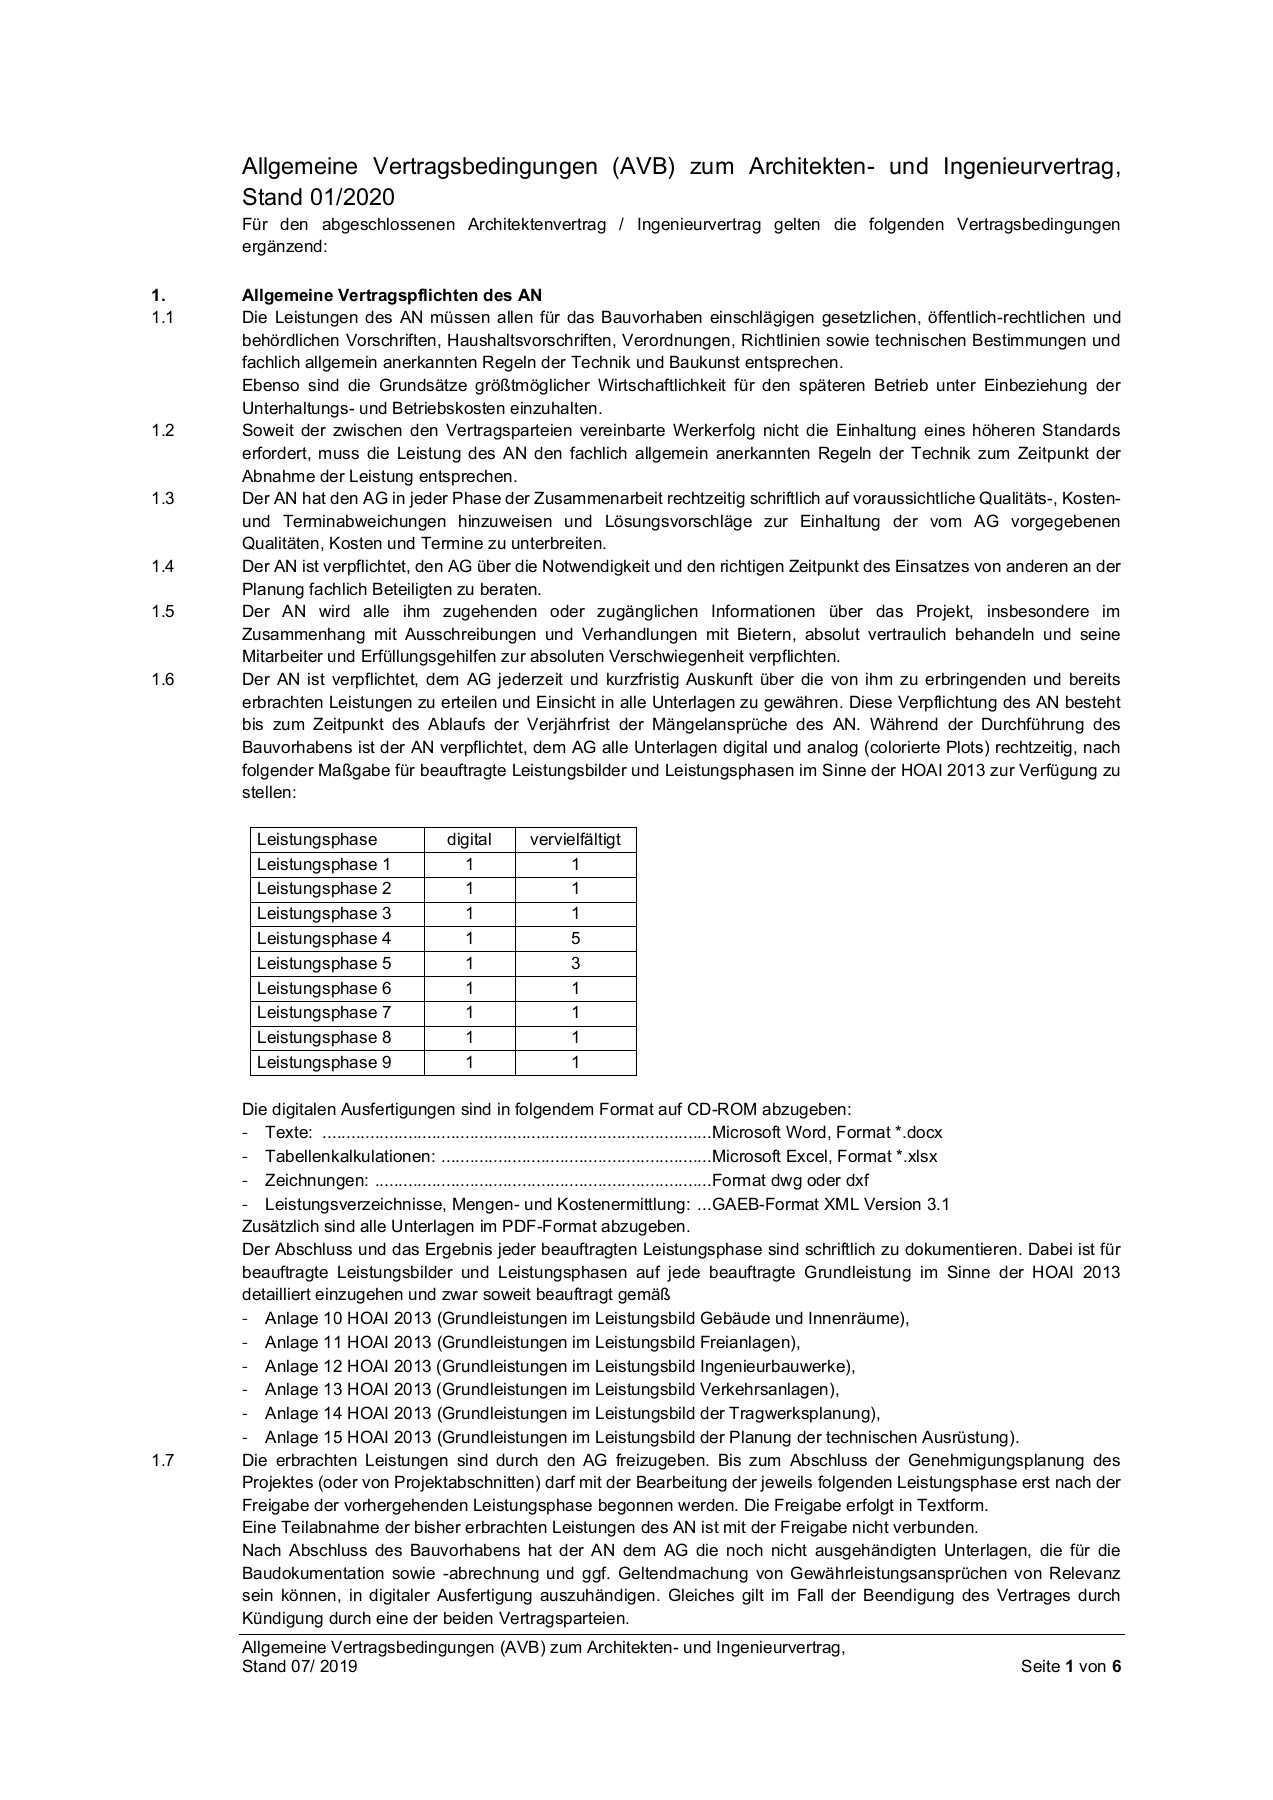 1 Muster Architektenvertrag Stand 20 01 30 Anlage 1 Avb Pages 1 6 Flip Pdf Download Fliphtml5